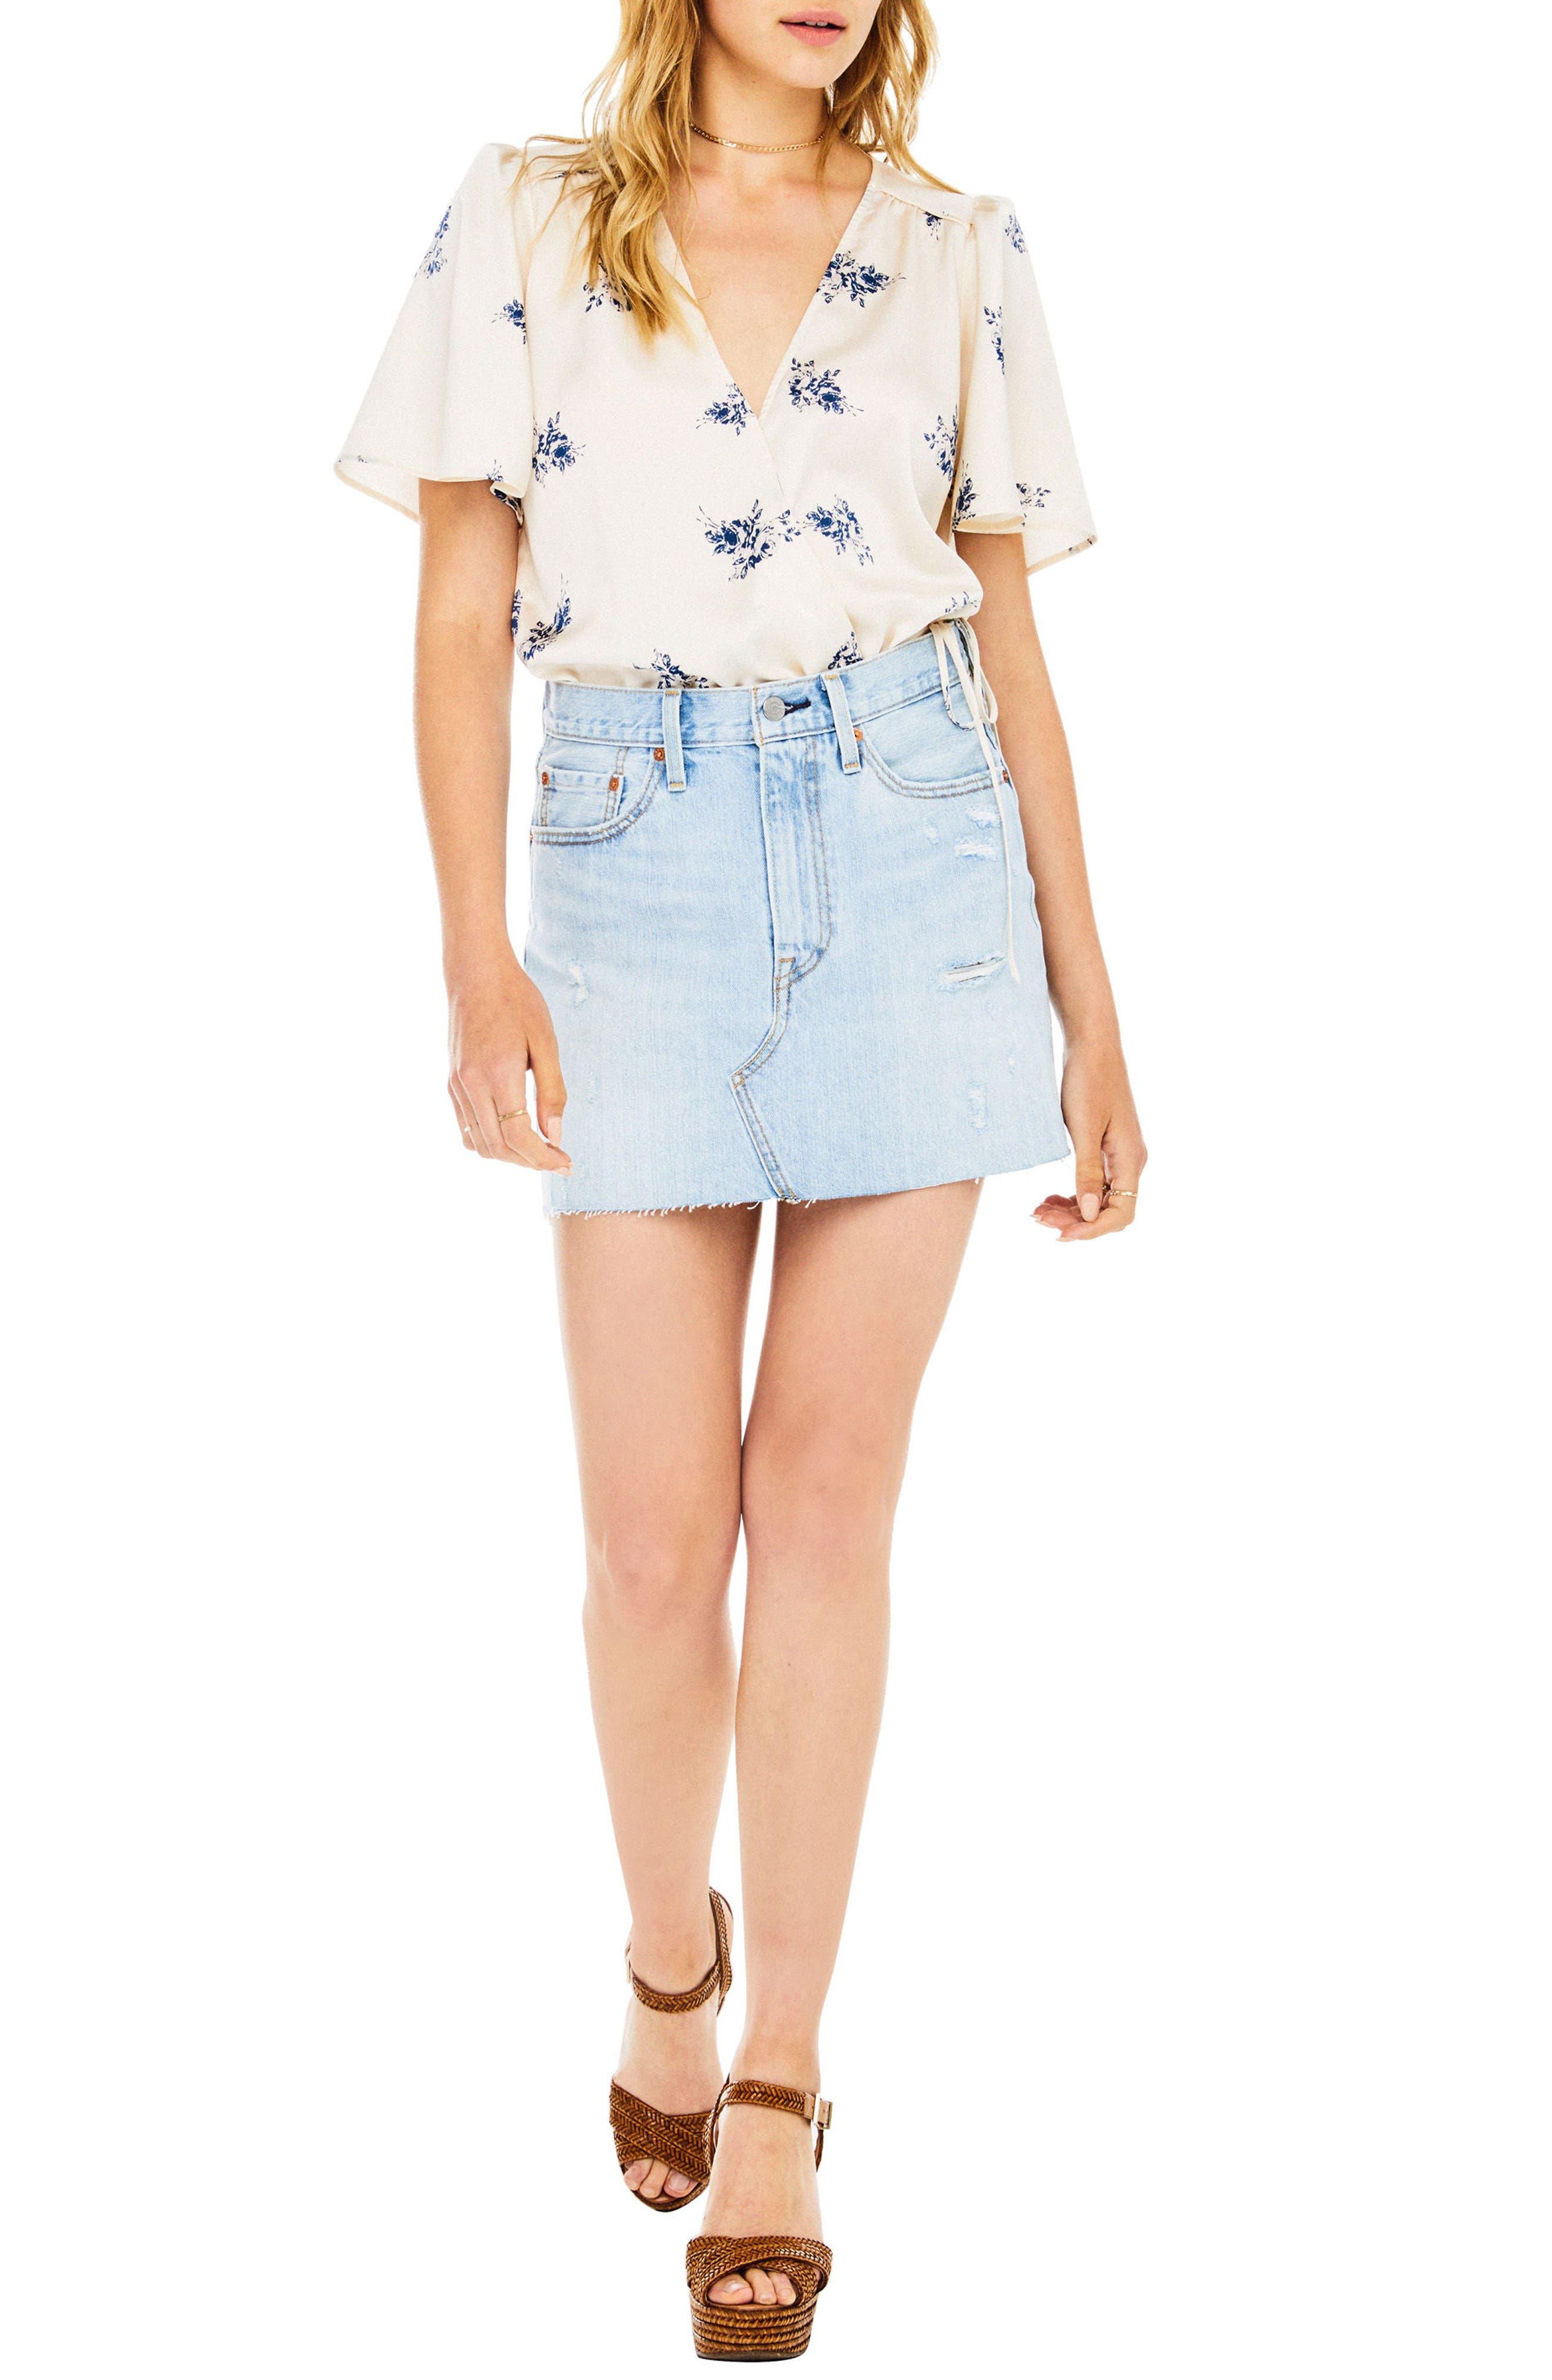 Hadley Bodysuit,                         Main,                         color, Cream Satin Floral